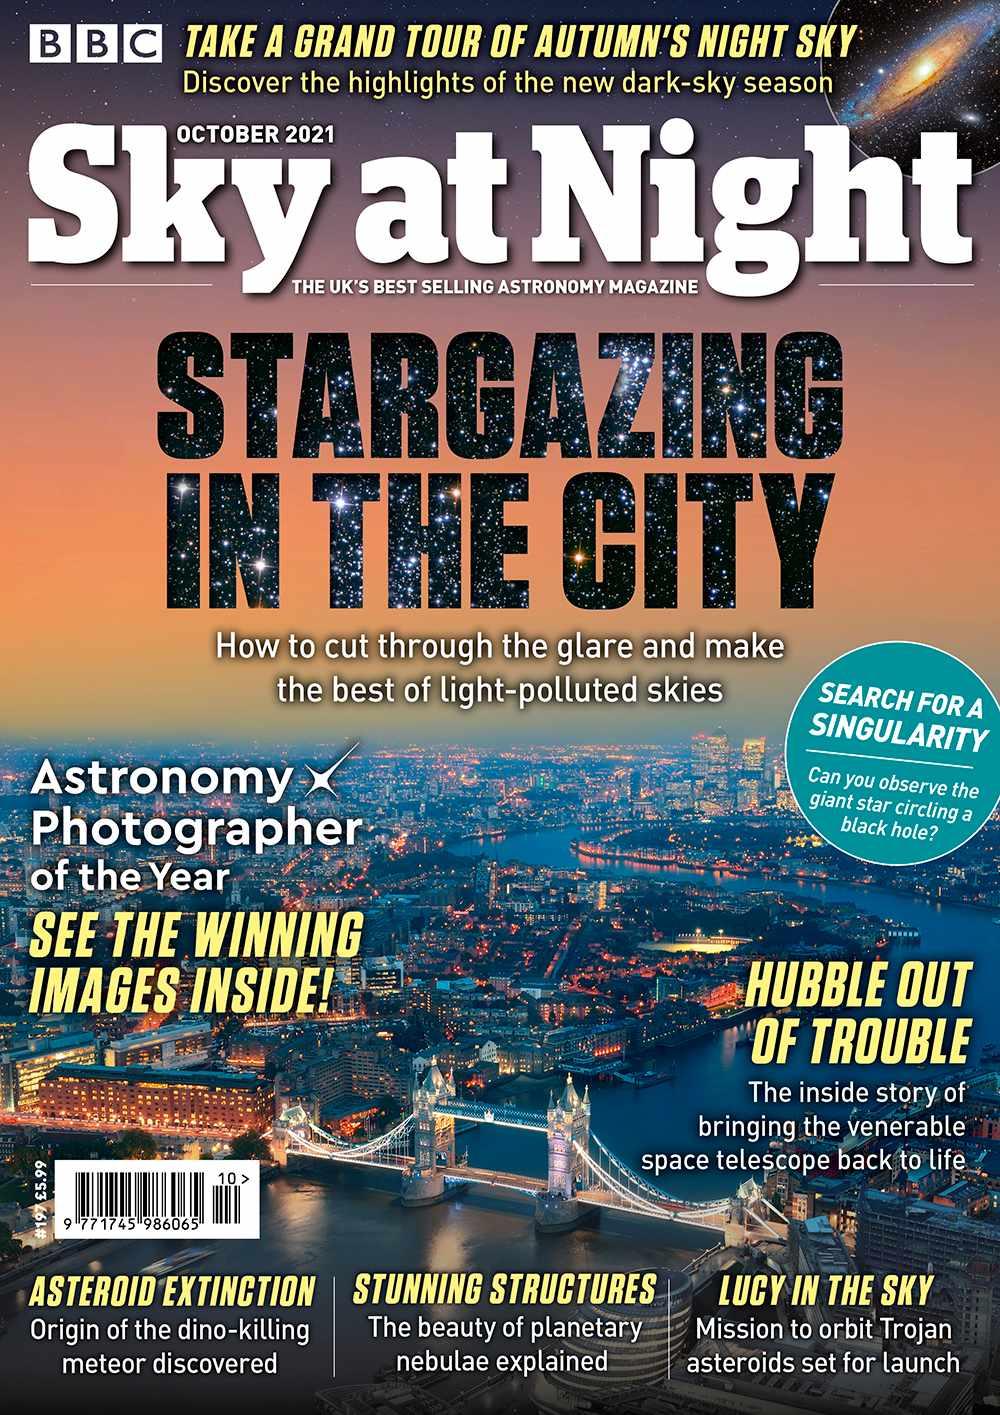 BBC Sky at Night Magazine October 2021 issue